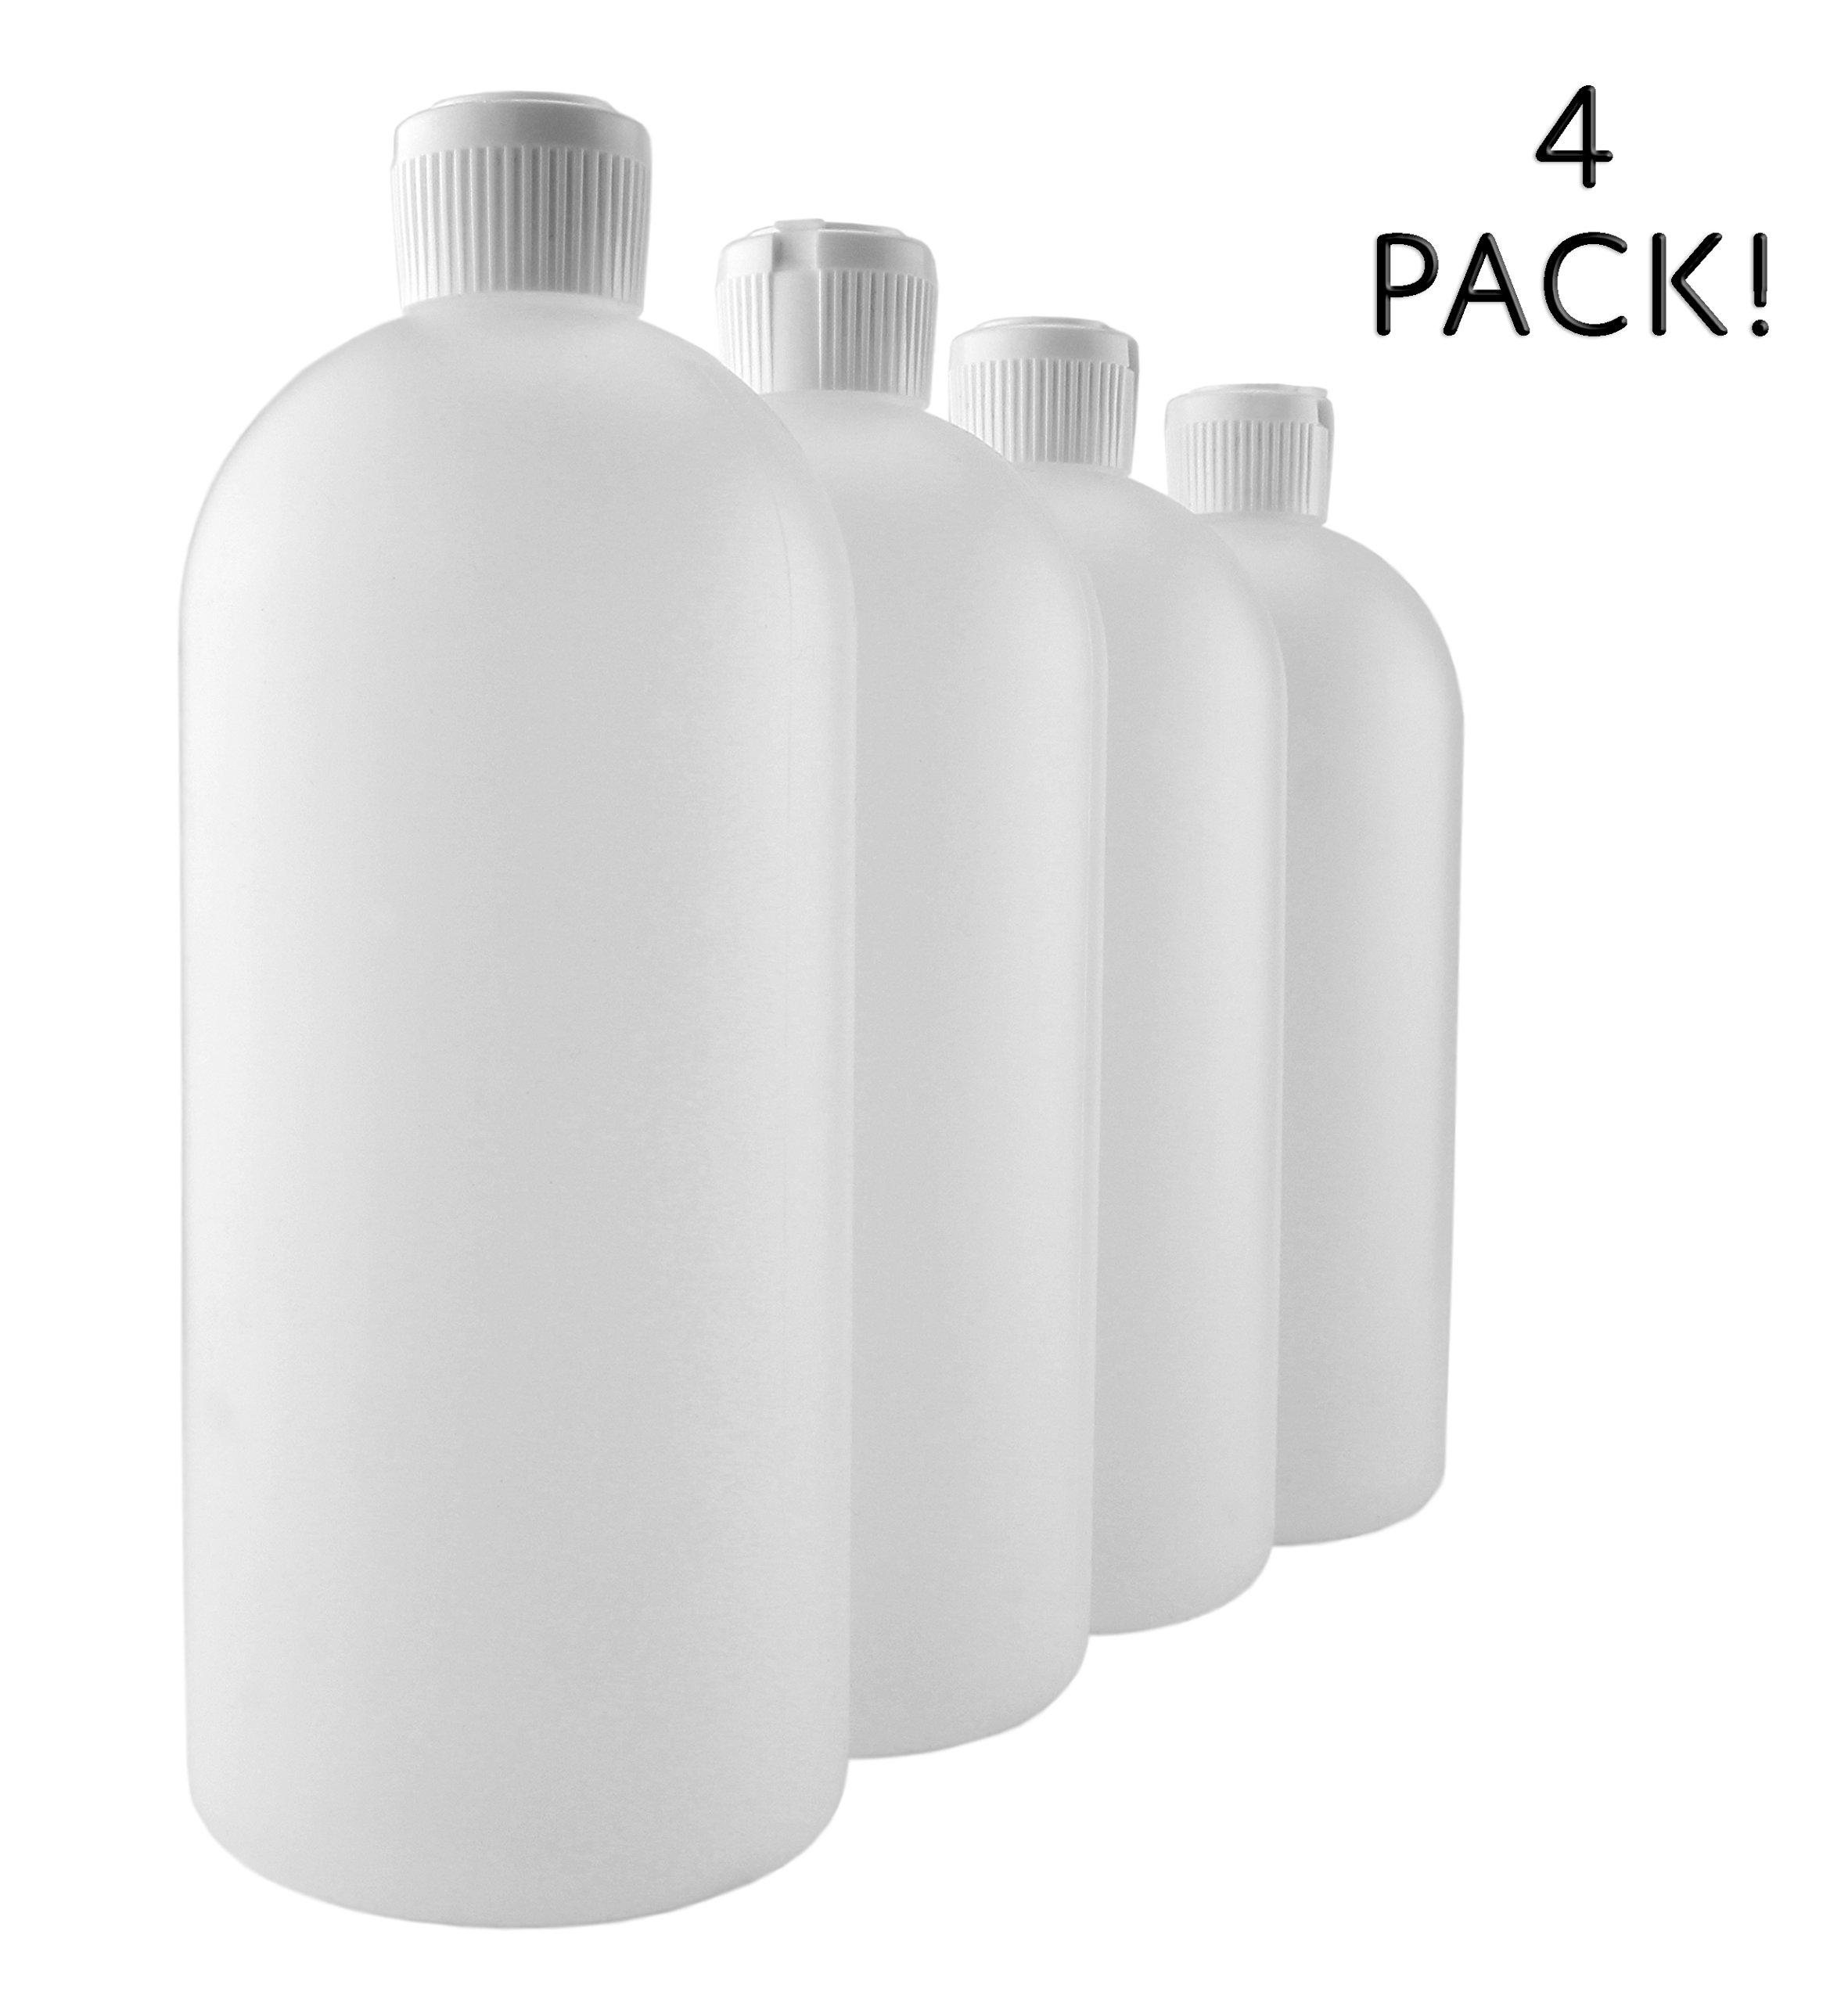 32-Ounce Flip Top Plastic Squeeze Bottles (4-Pack); Spout Style Tops